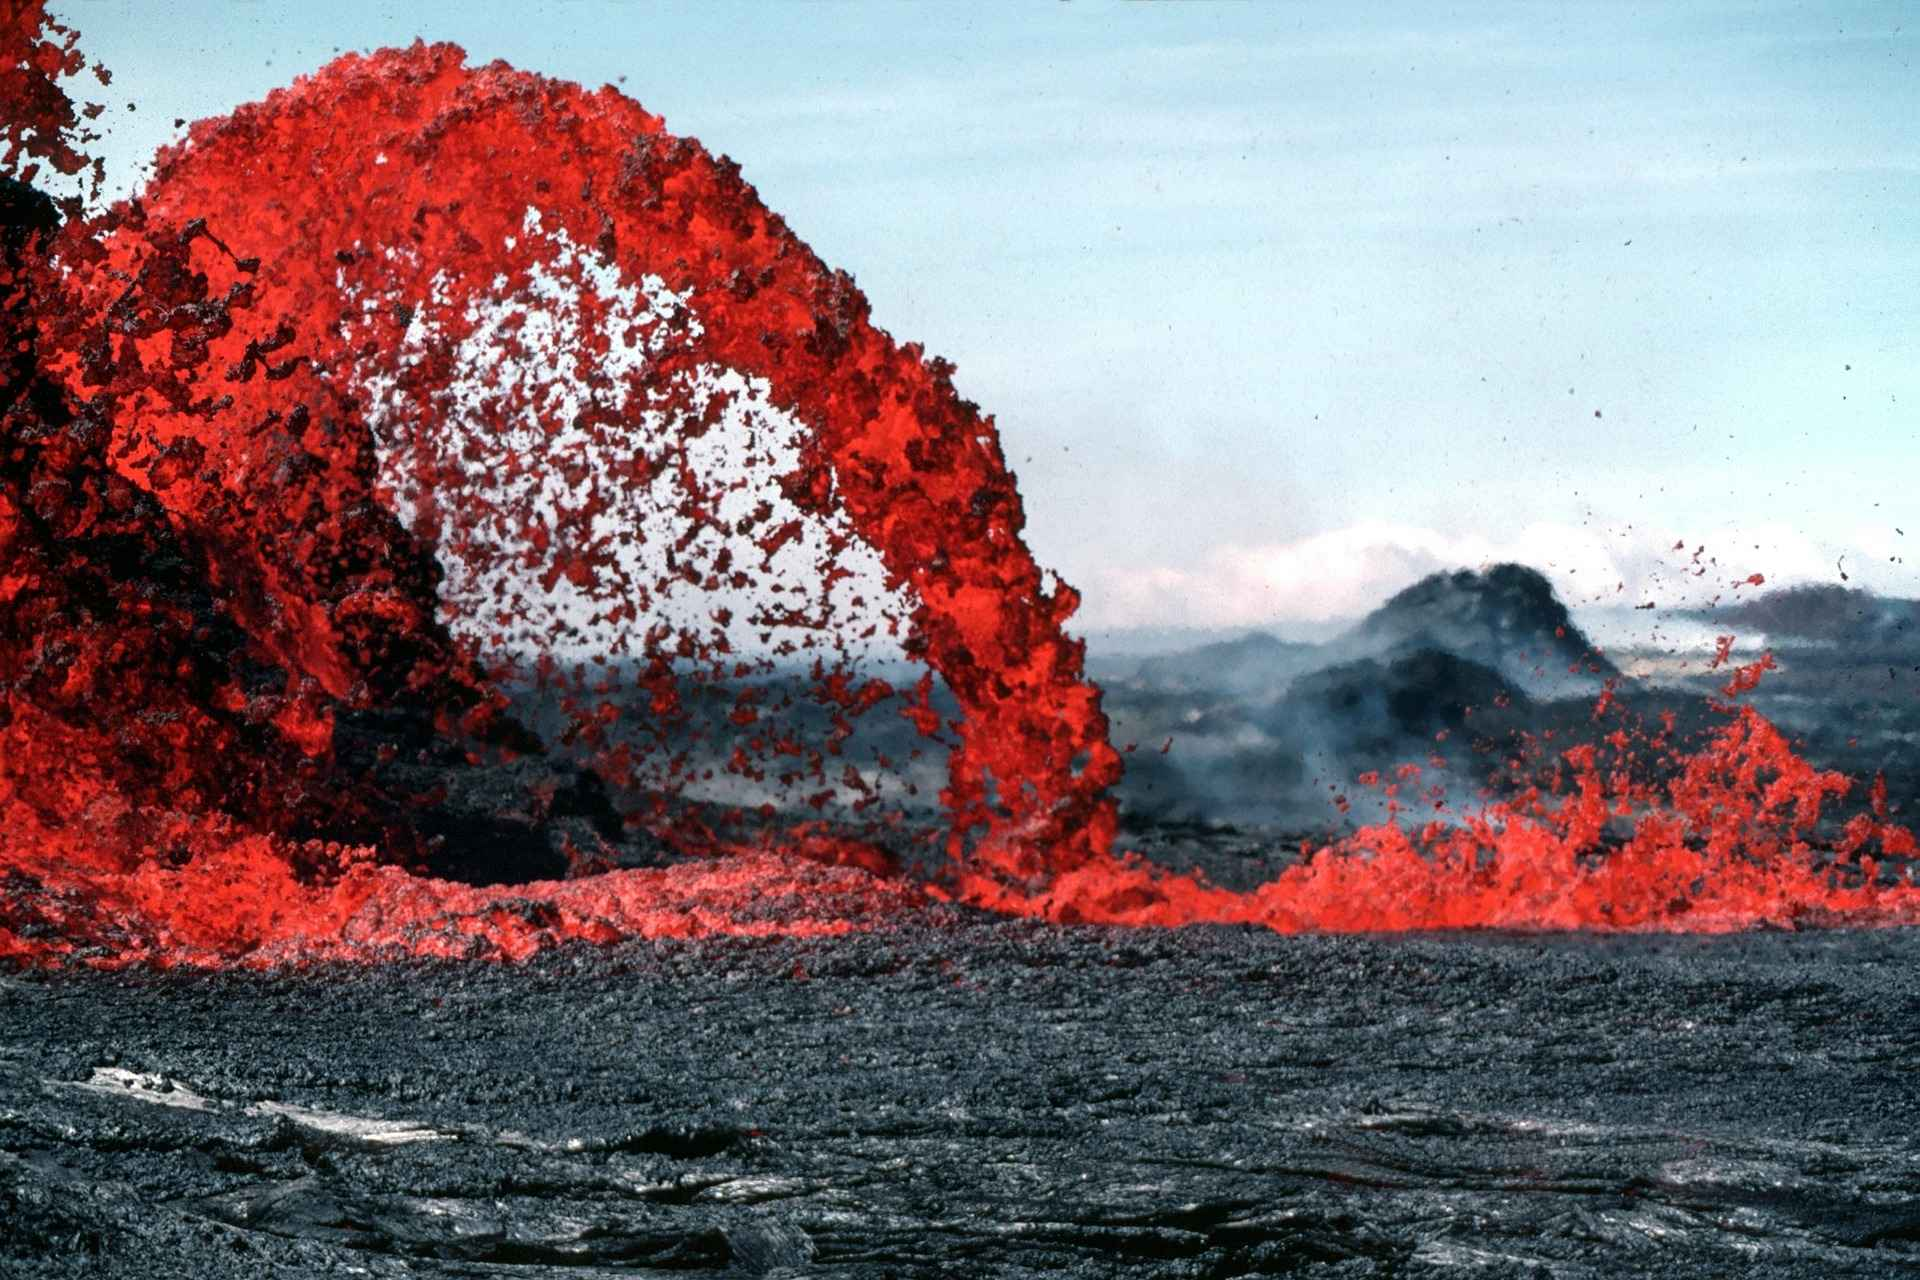 red hot spewing magma bursting volcano